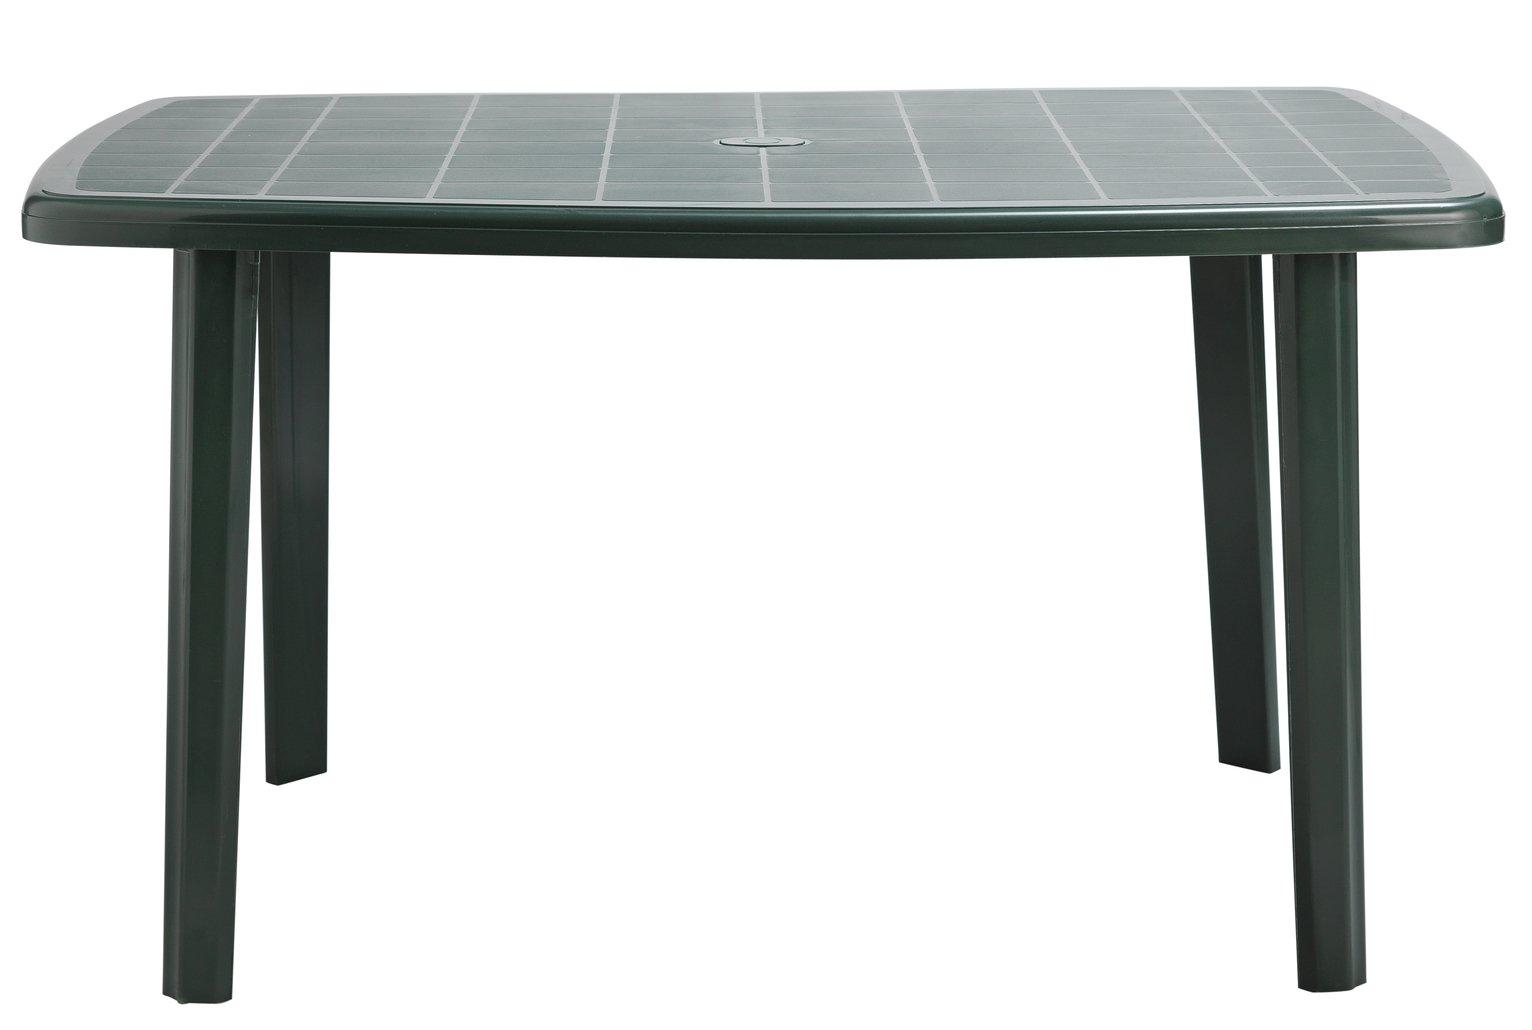 Garden tables argos home large oblong table cayman green